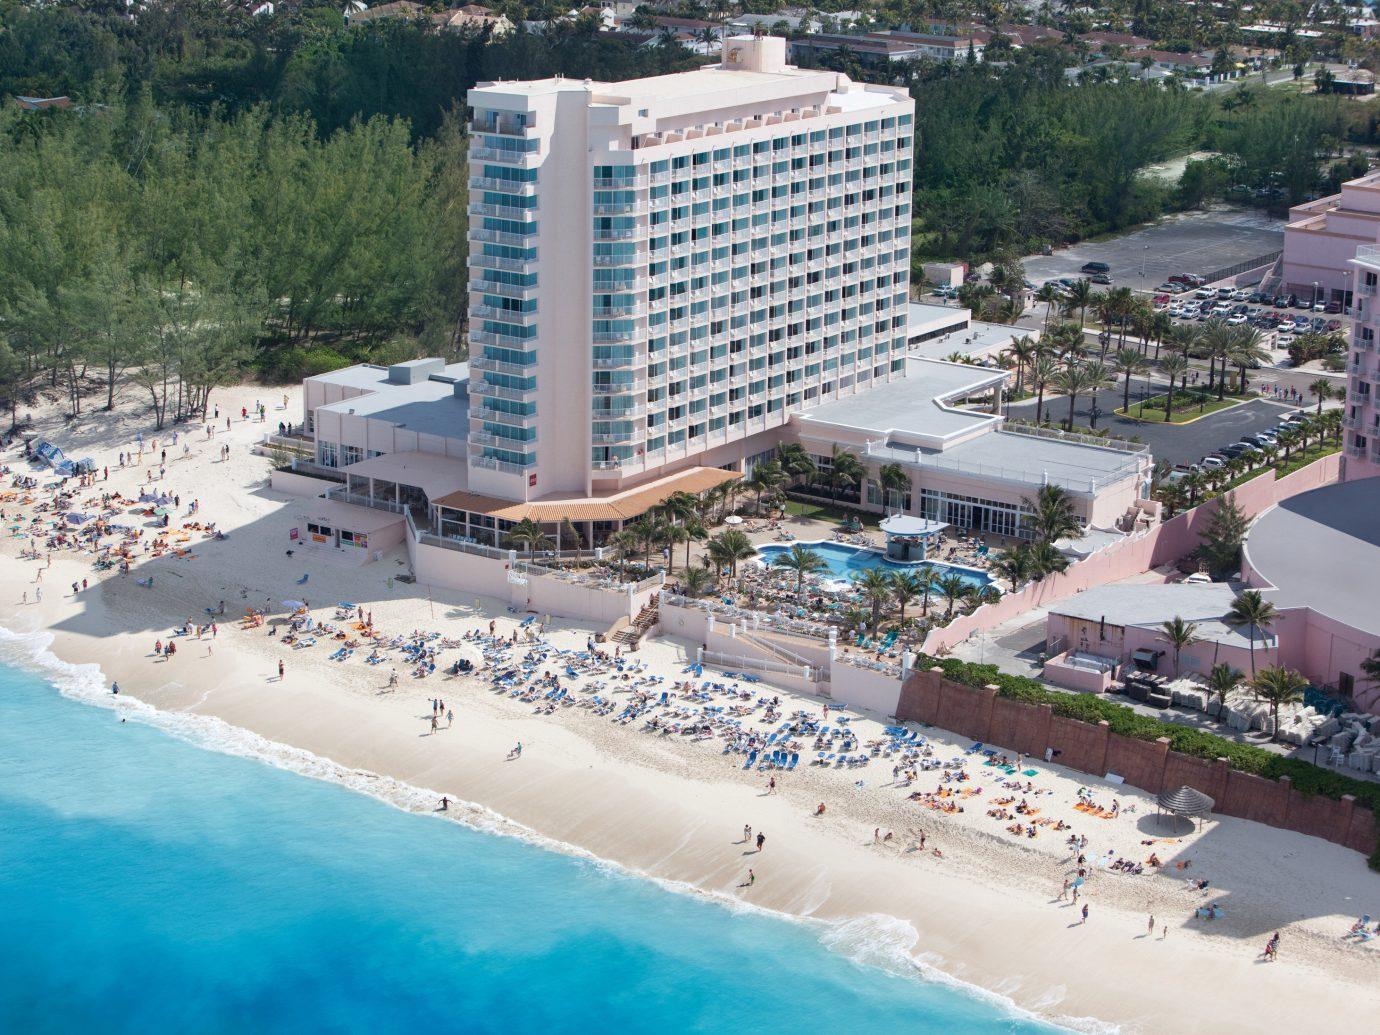 Aerial view of Hotel Riu Palace Paradise Island